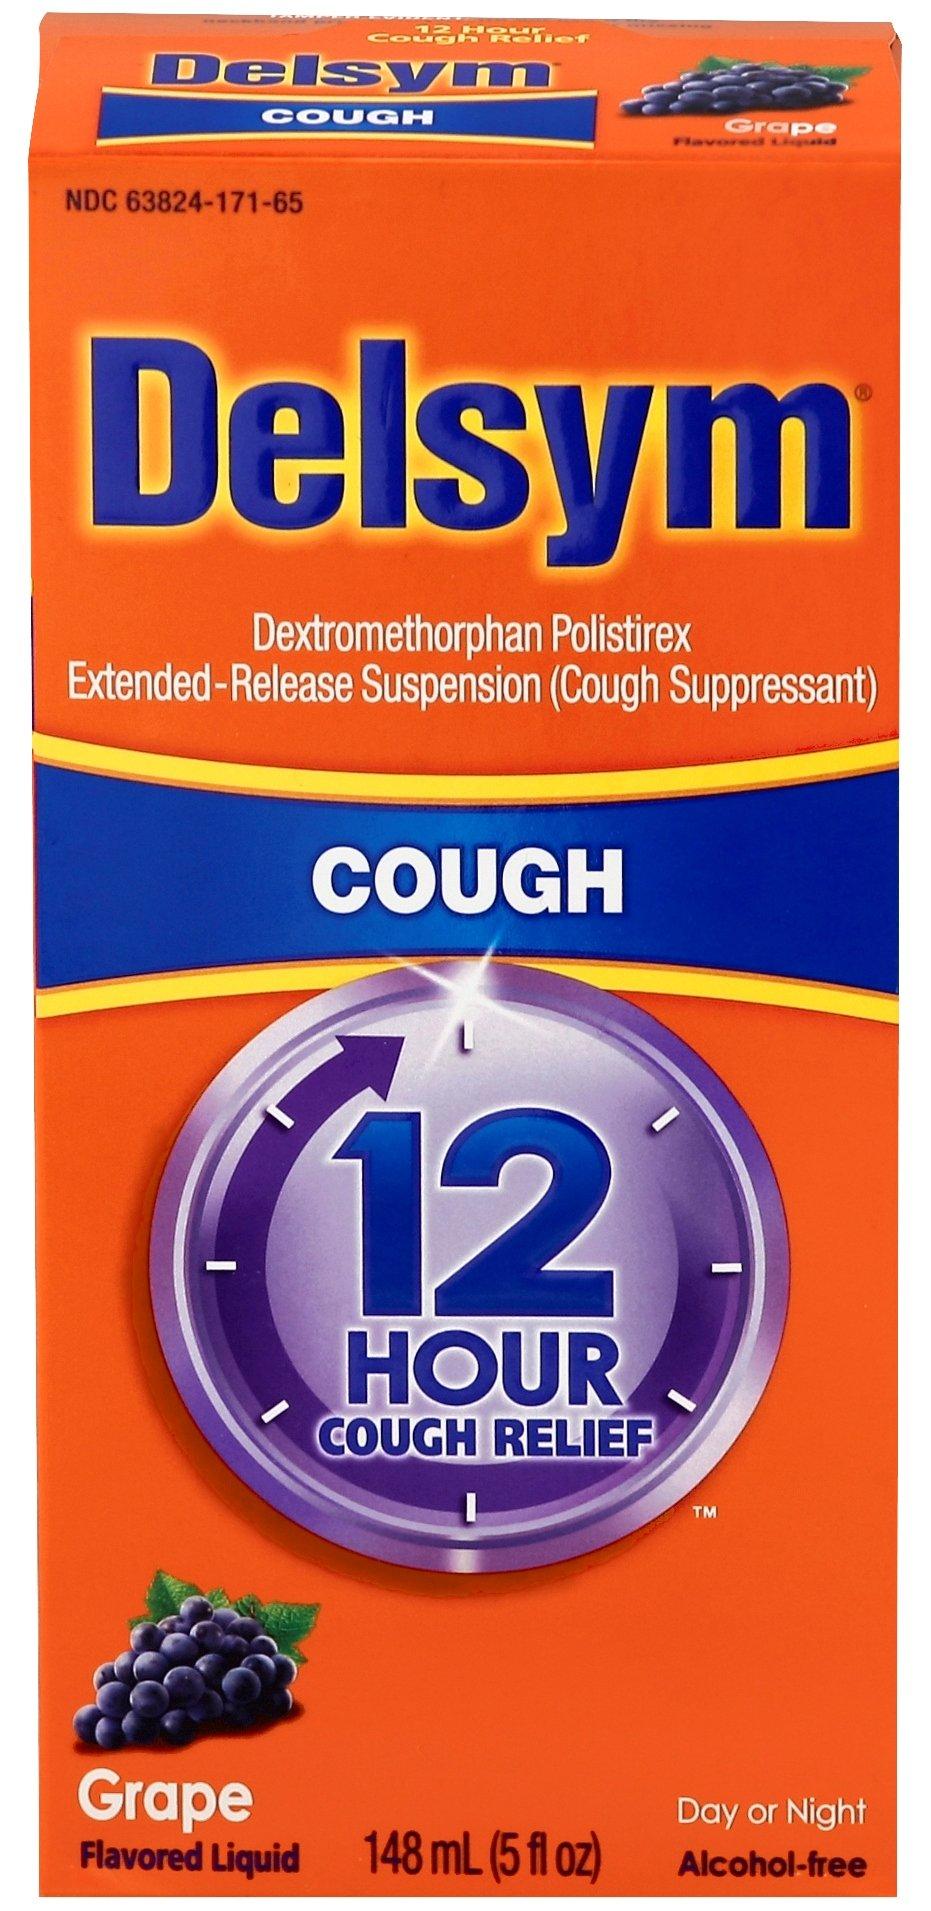 Delsym Adult 12 Hr Cough Relief Liquid, Grape, 5oz